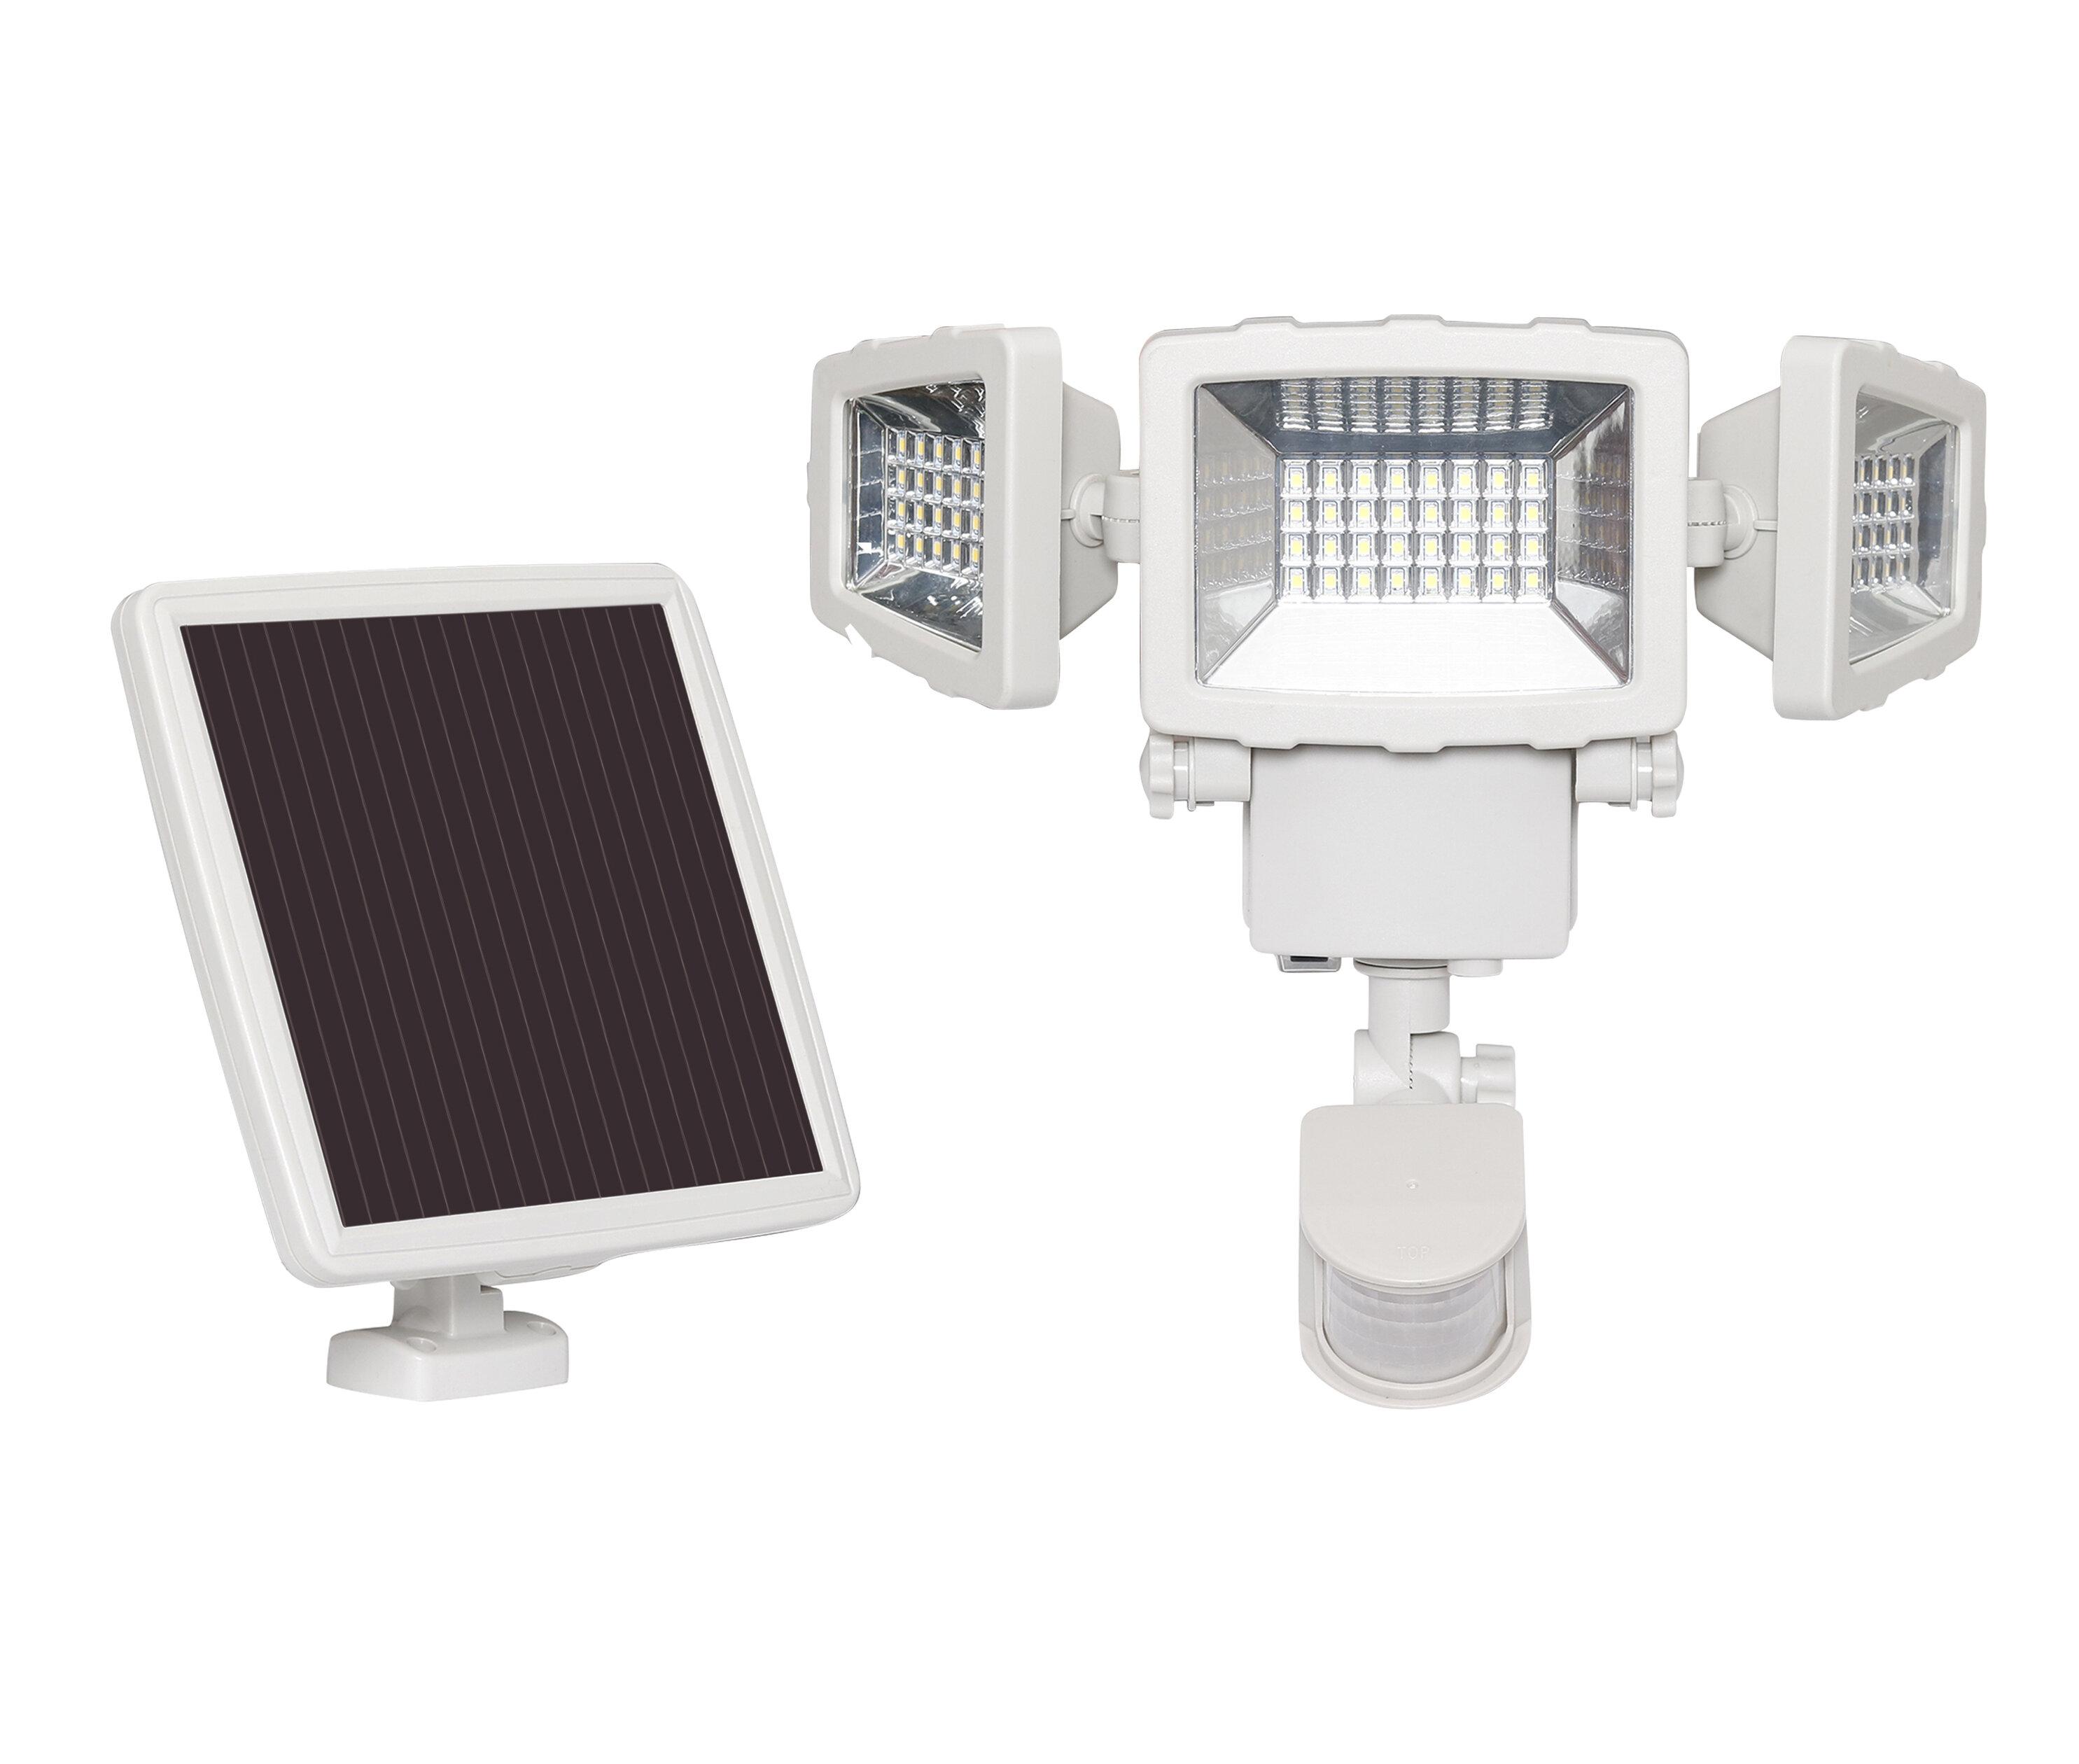 Westinghouse Solar Lighting Intelligent Triple Head Led Solar Powered Outdoor Security Flood Light With Motion Sensor Reviews Wayfair